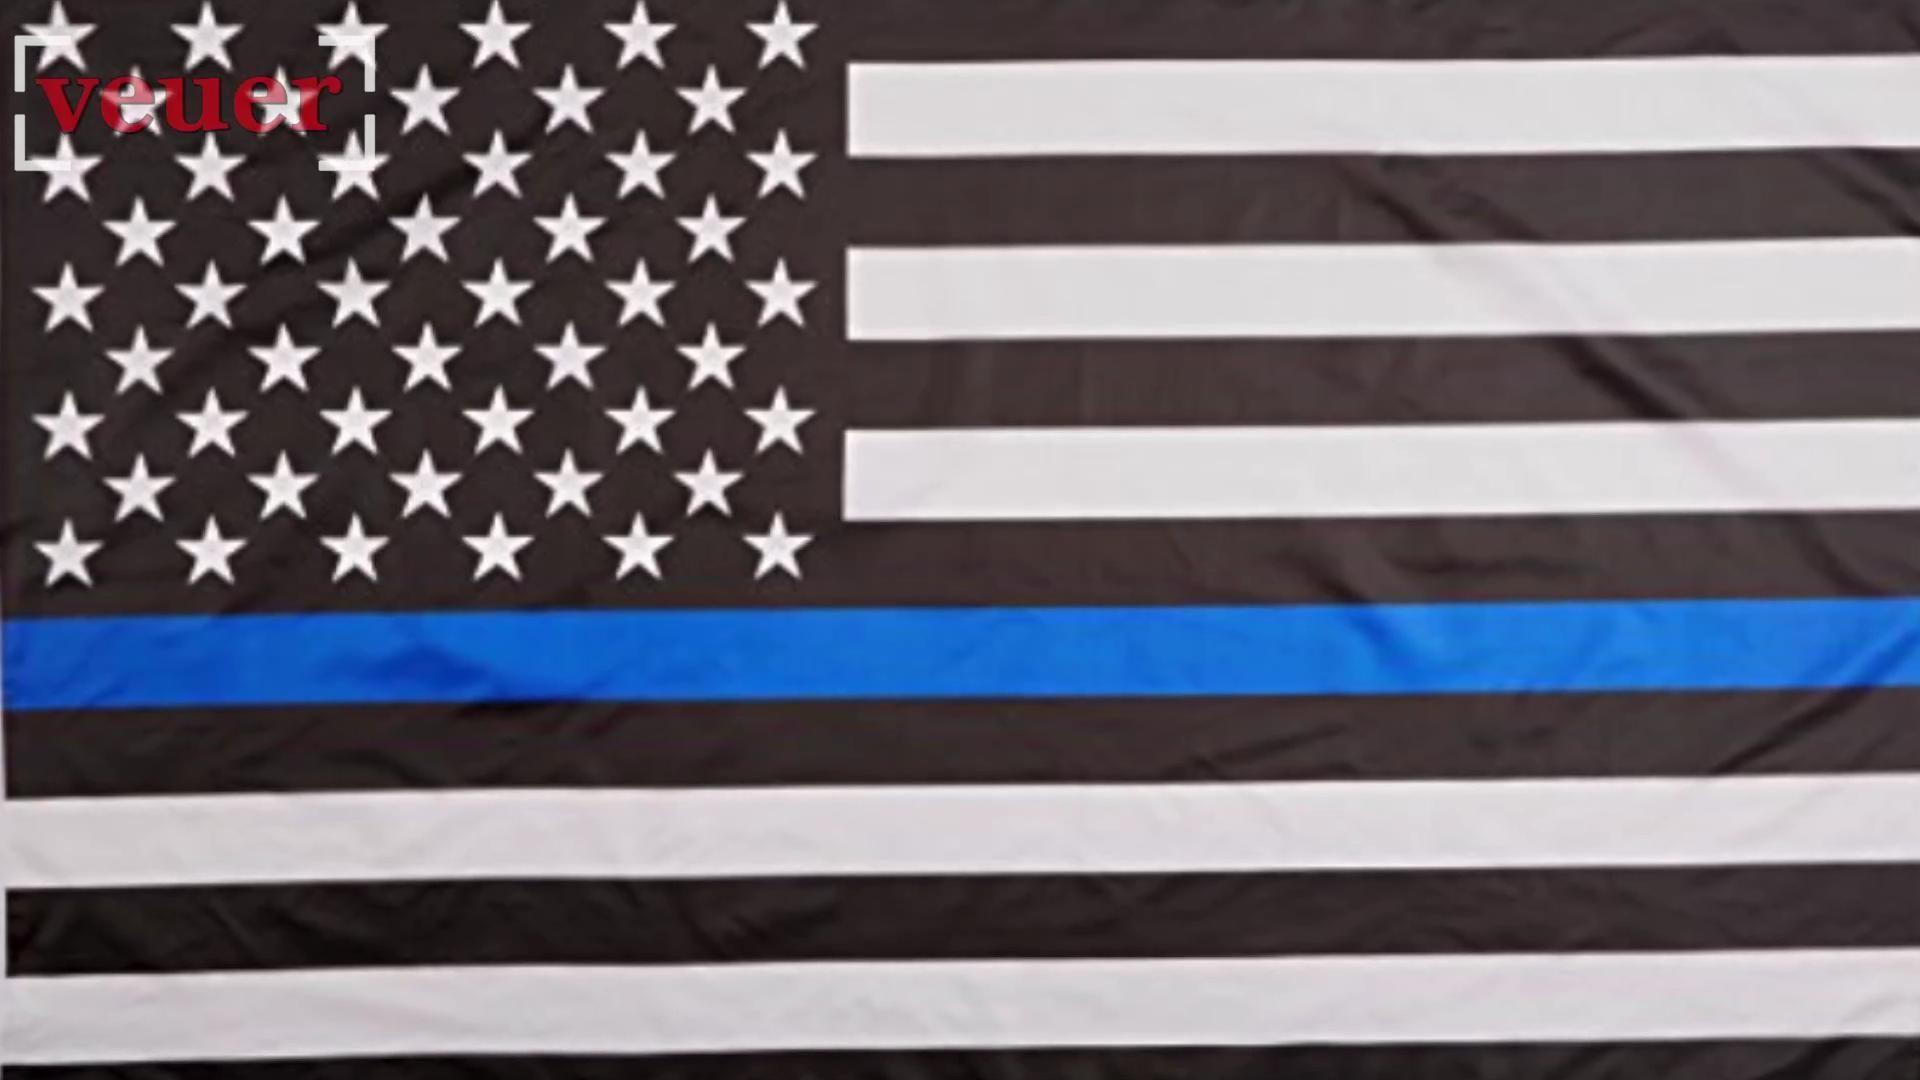 Police officer's daughter asked to remove 'Blue Lives Matter' flag